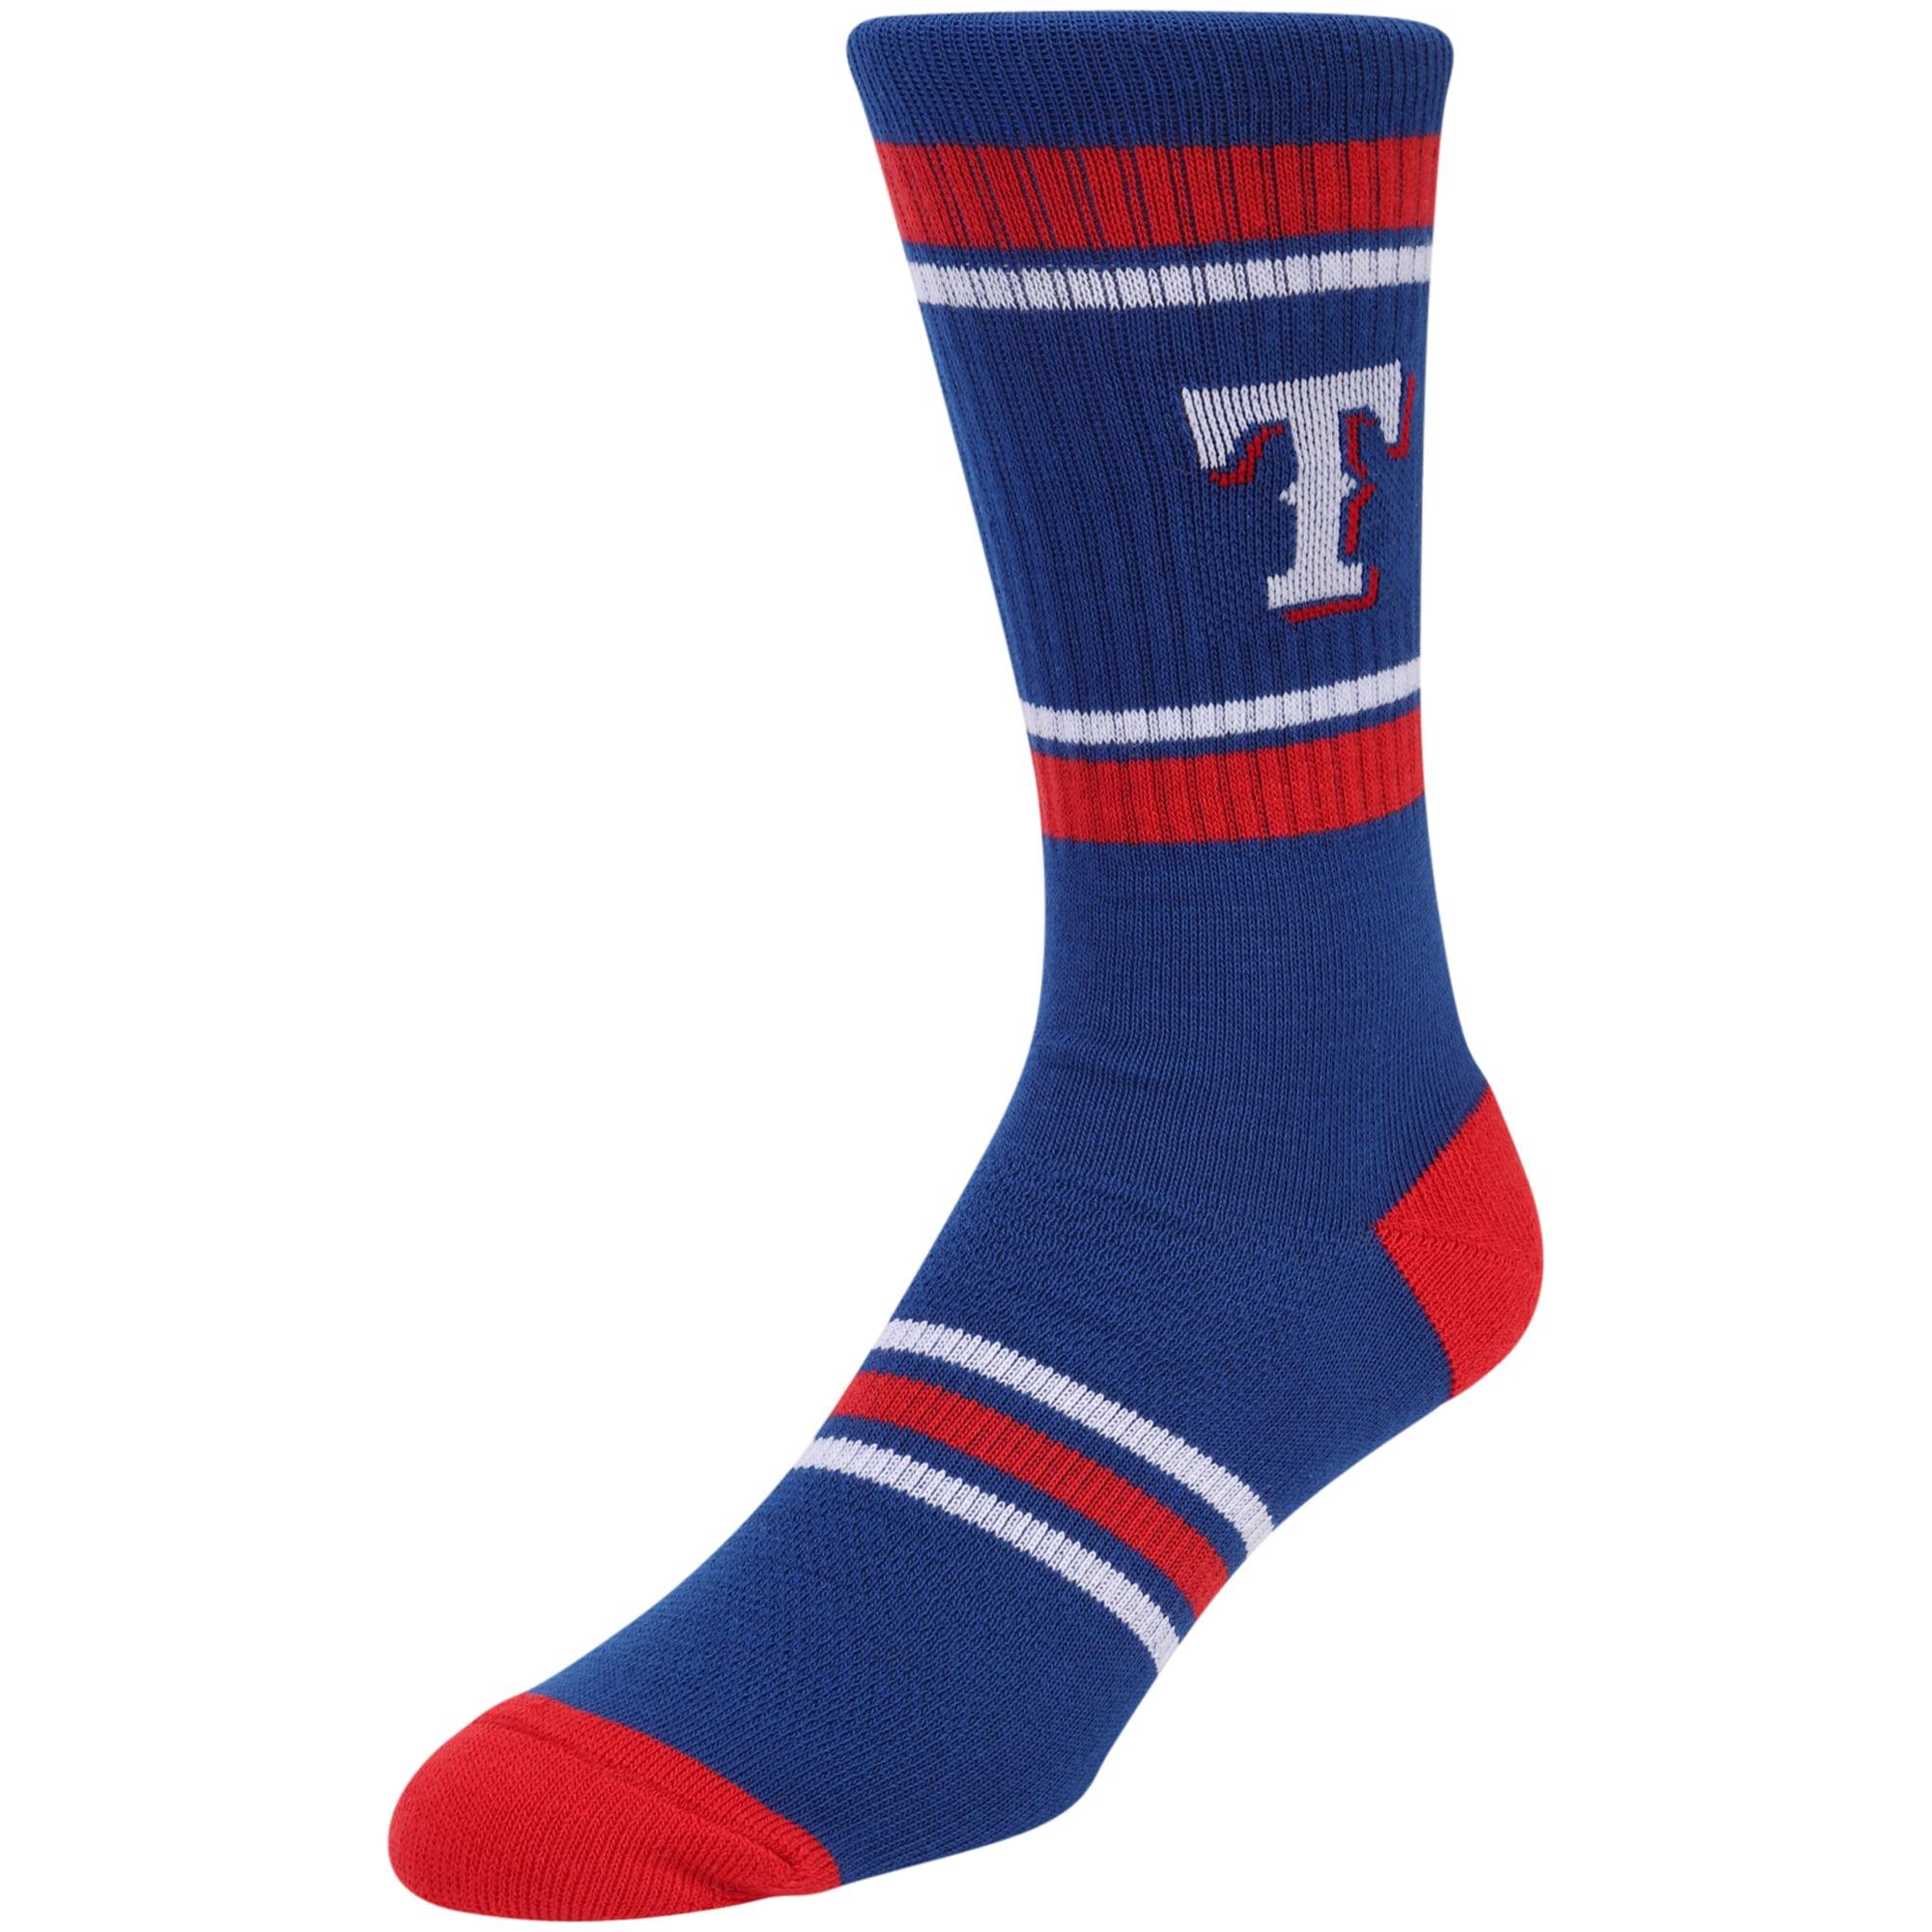 Texas Rangers Stripe Crew Socks - Blue